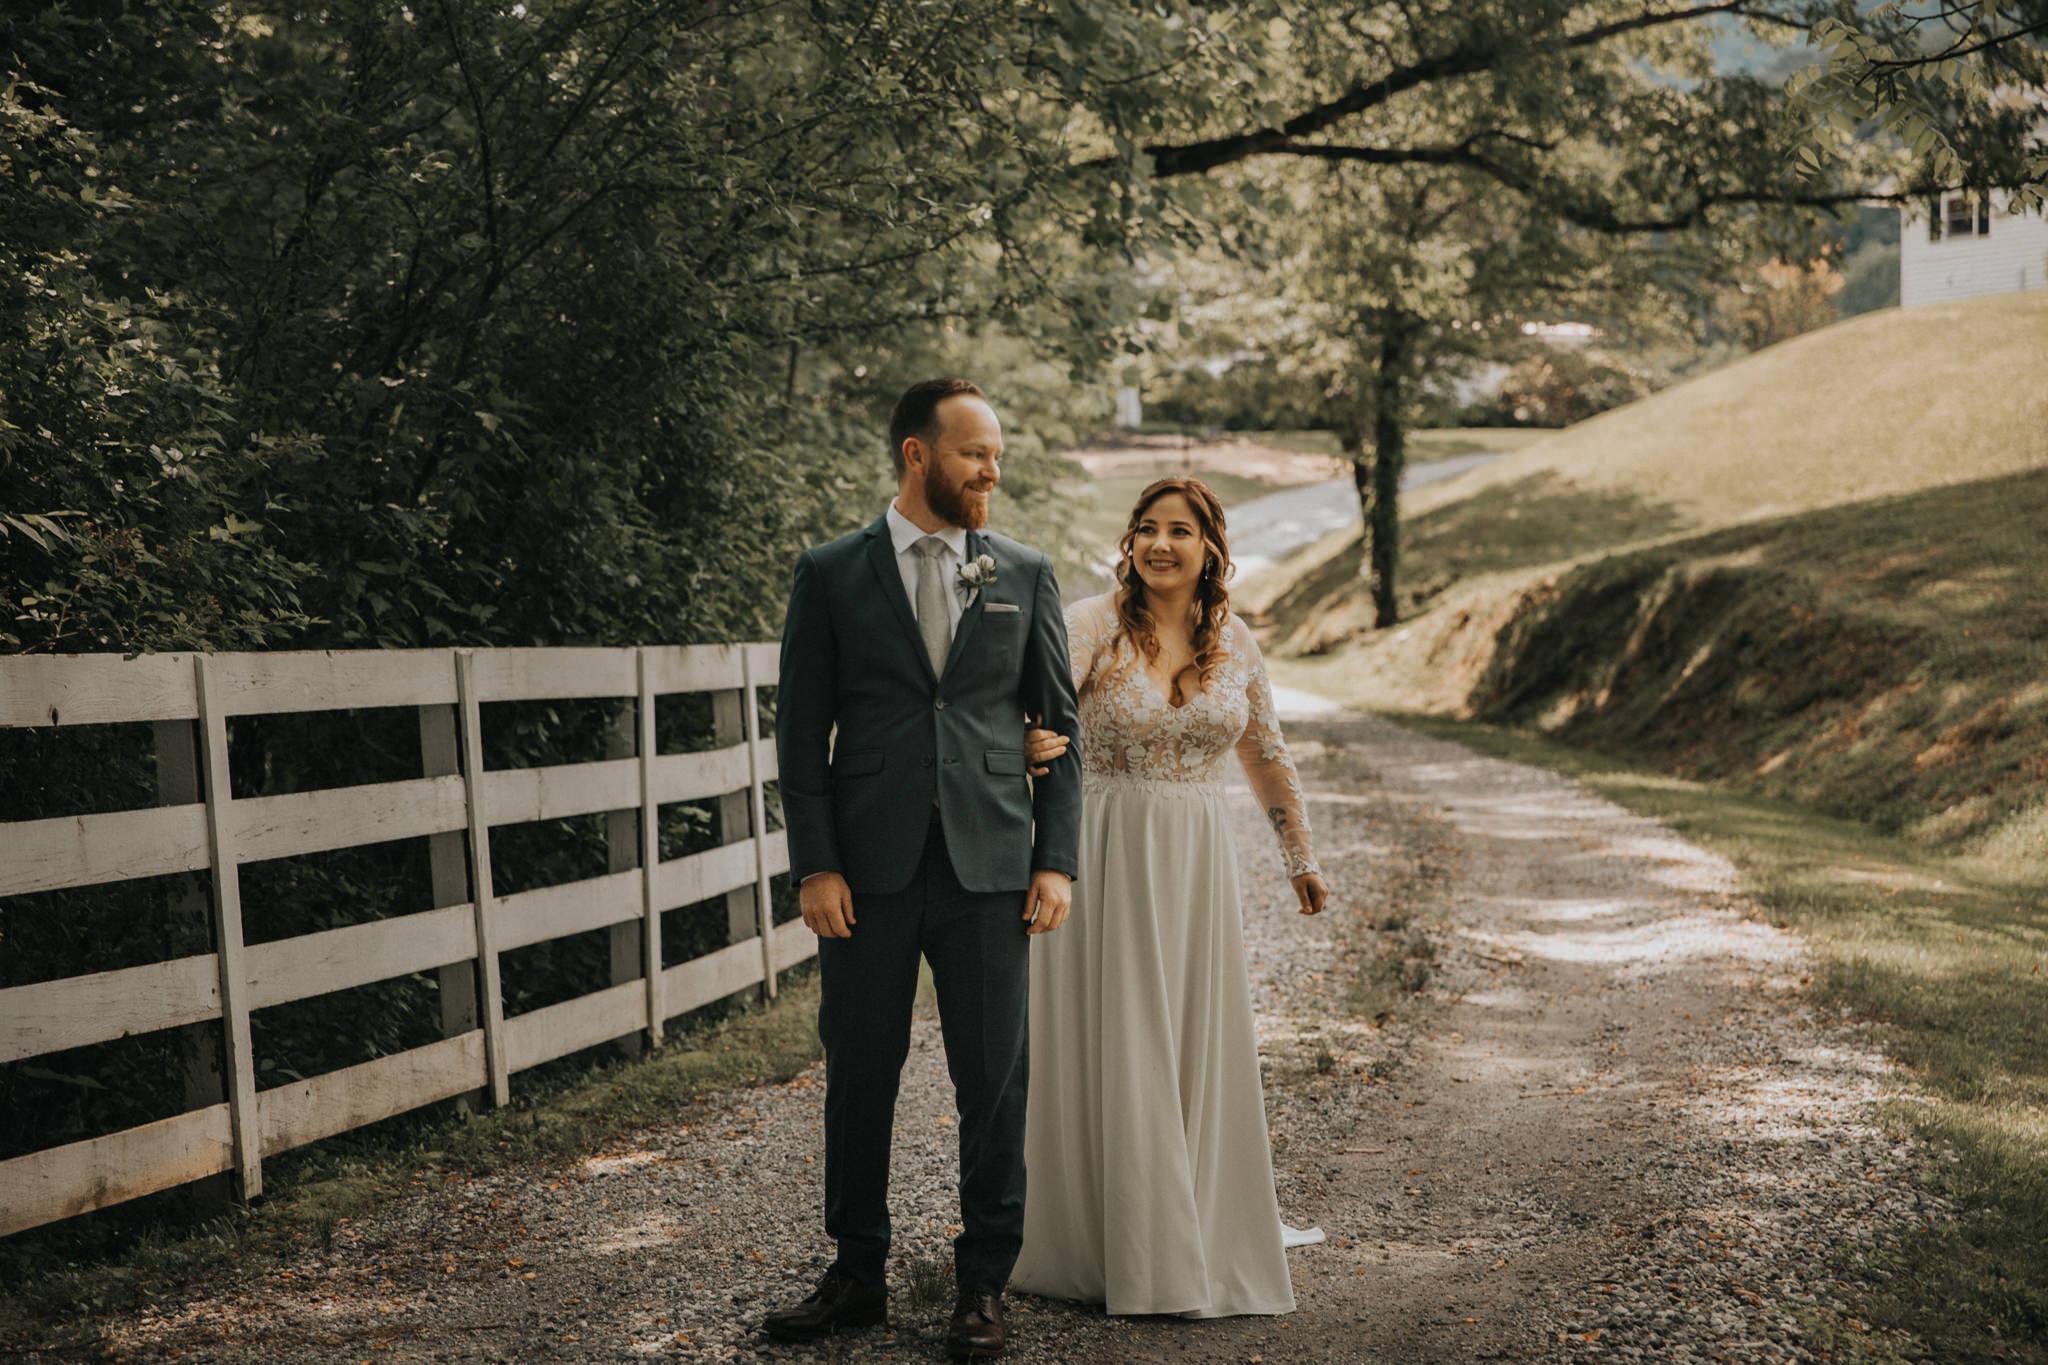 KateMatt-North-Georgia-Wedding-Photographer-Mountain-Laurel-Farm-42.jpg